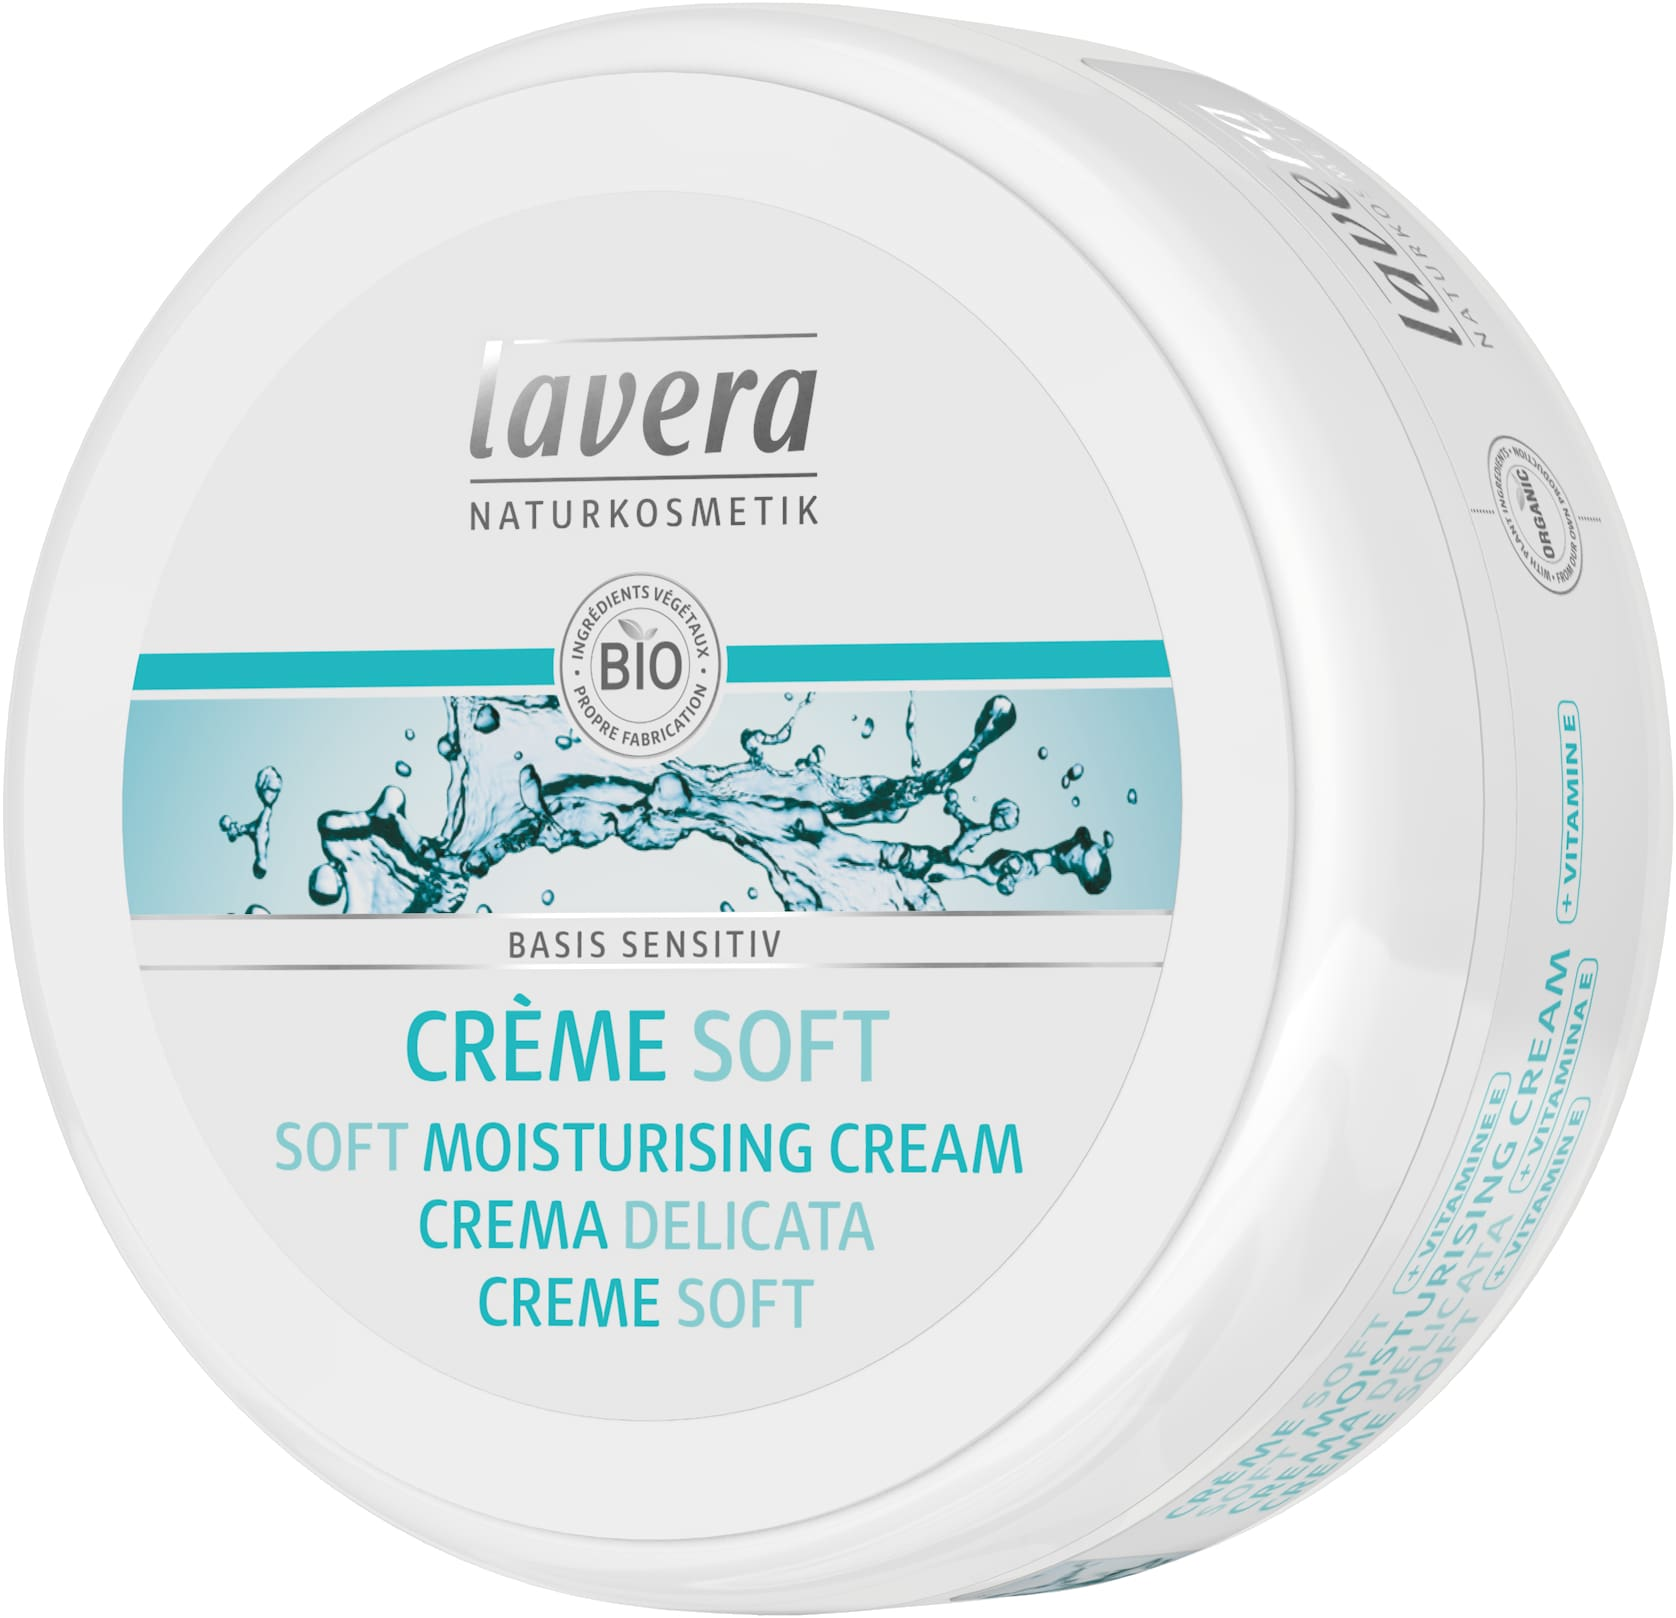 basis sensitiv Creme Soft